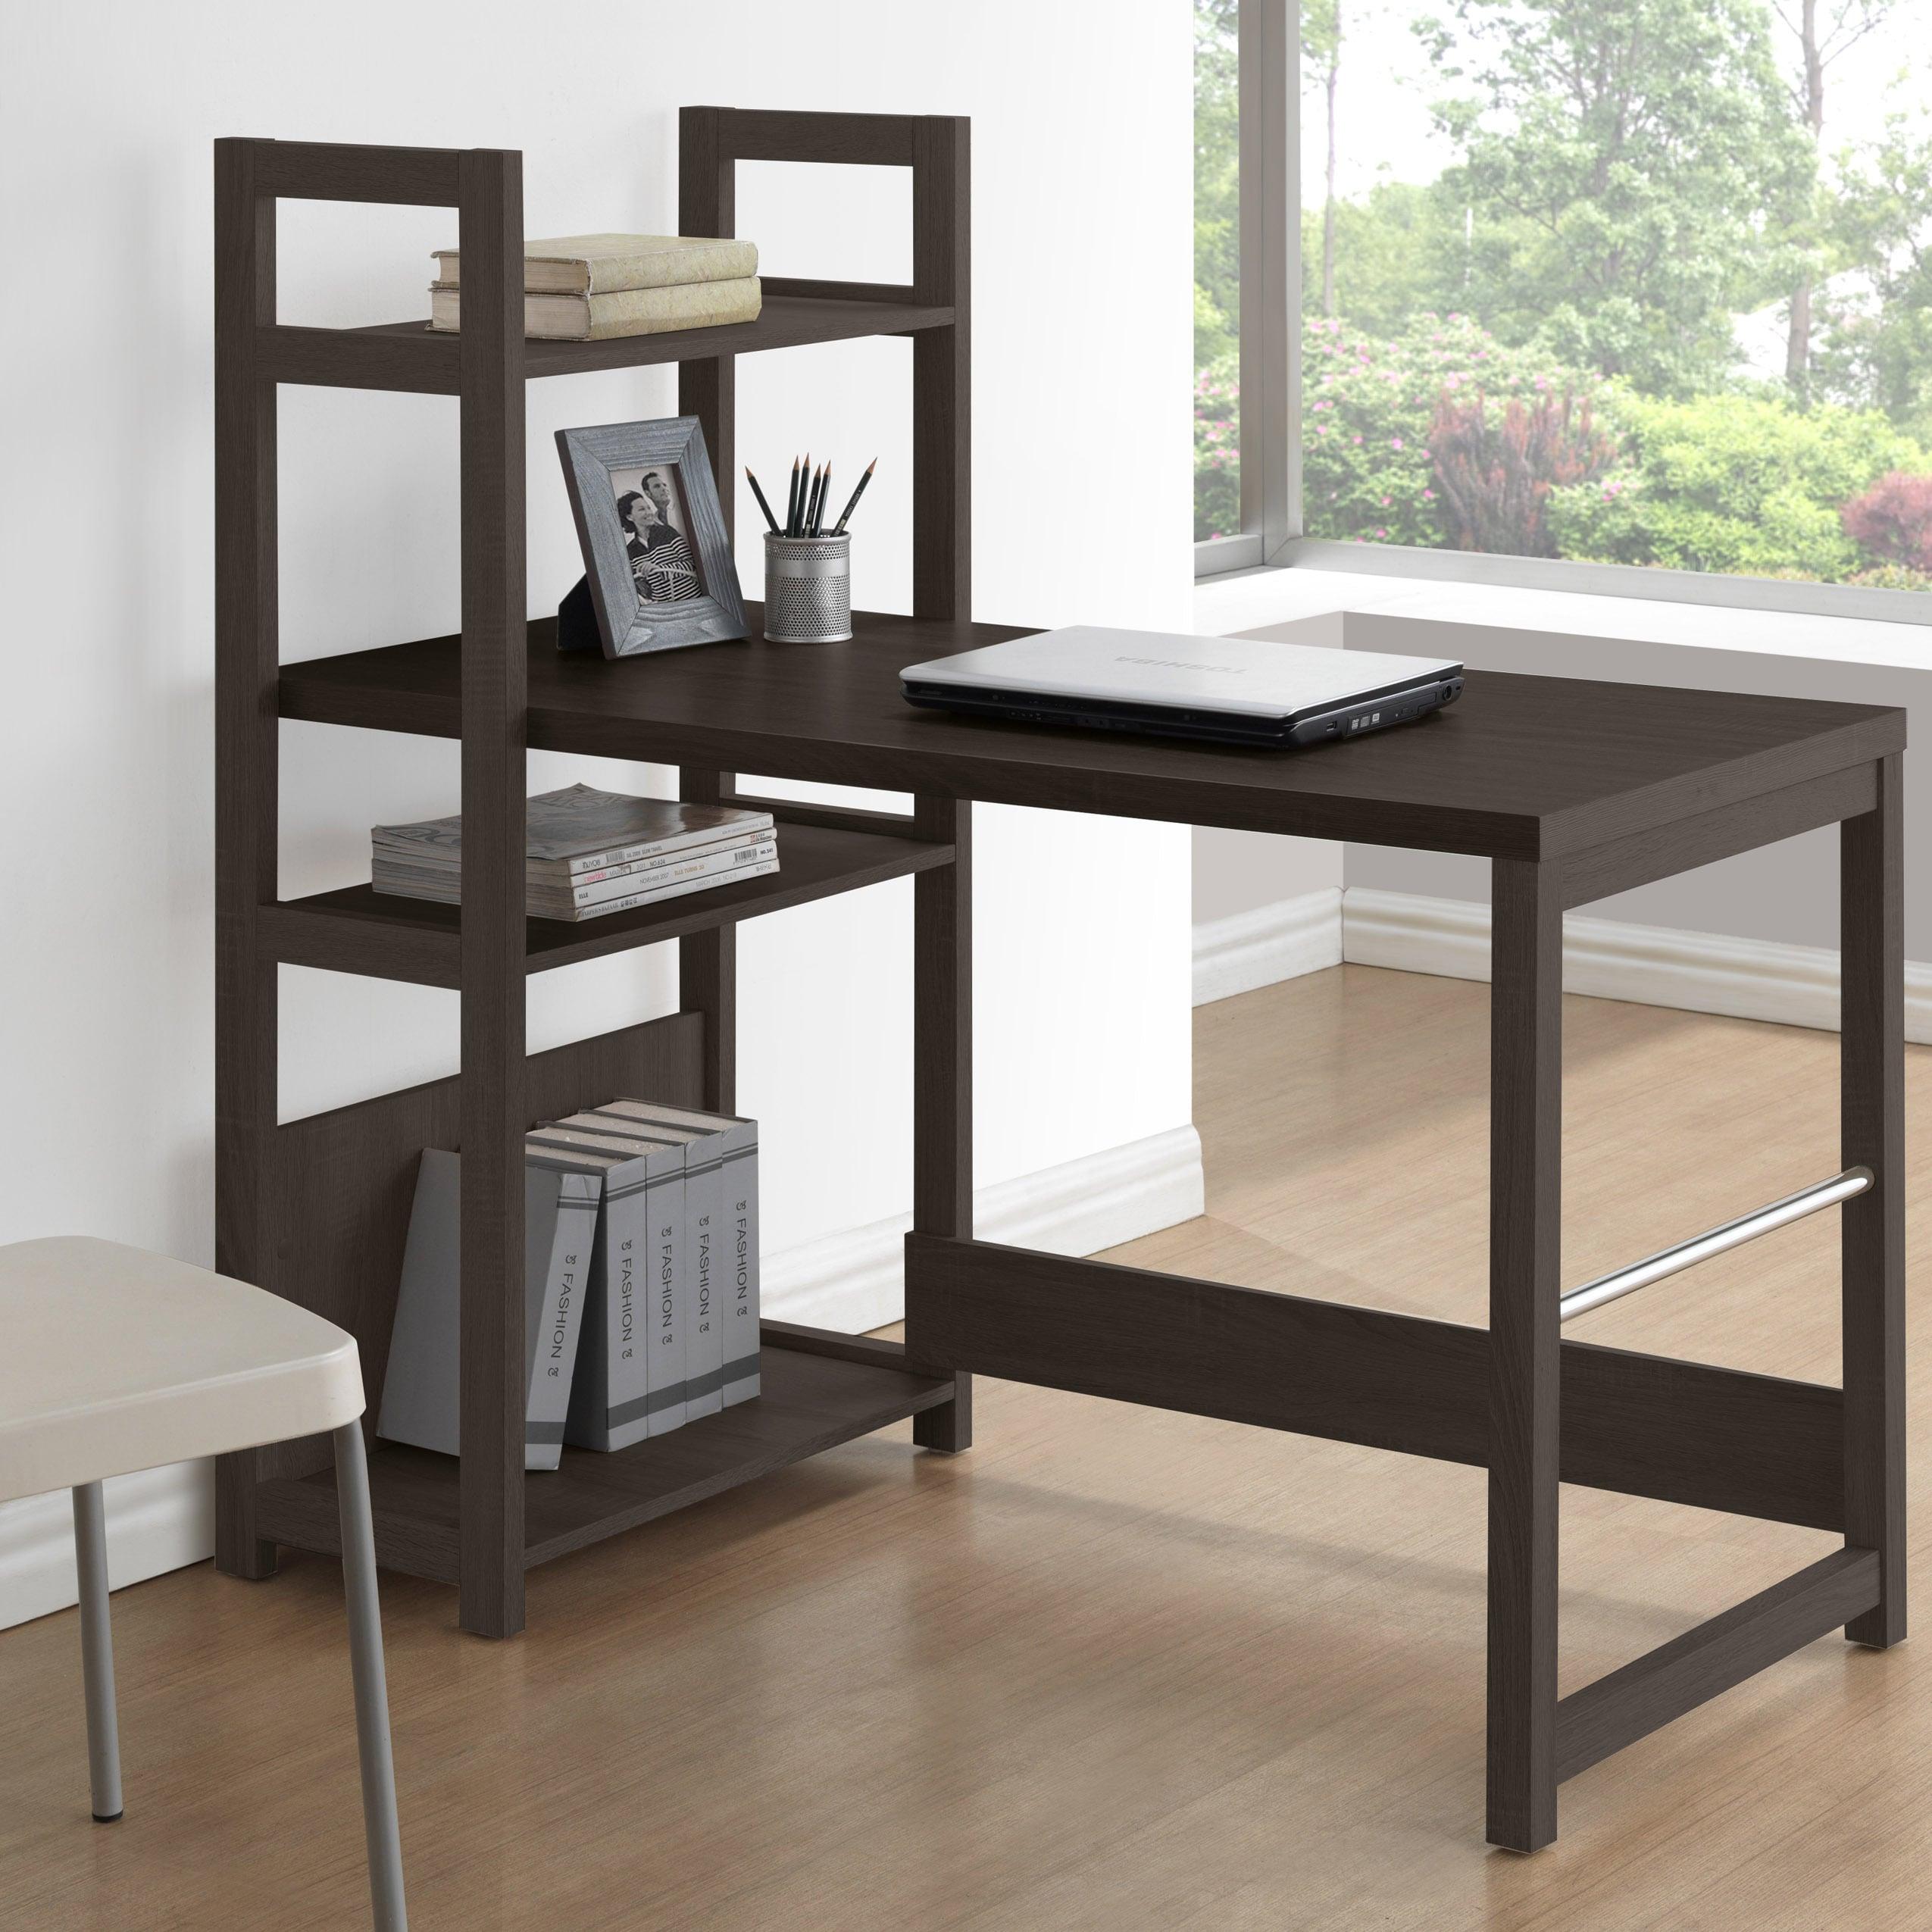 Shop CorLiving Folio Black Espresso Bookshelf Styled Desk